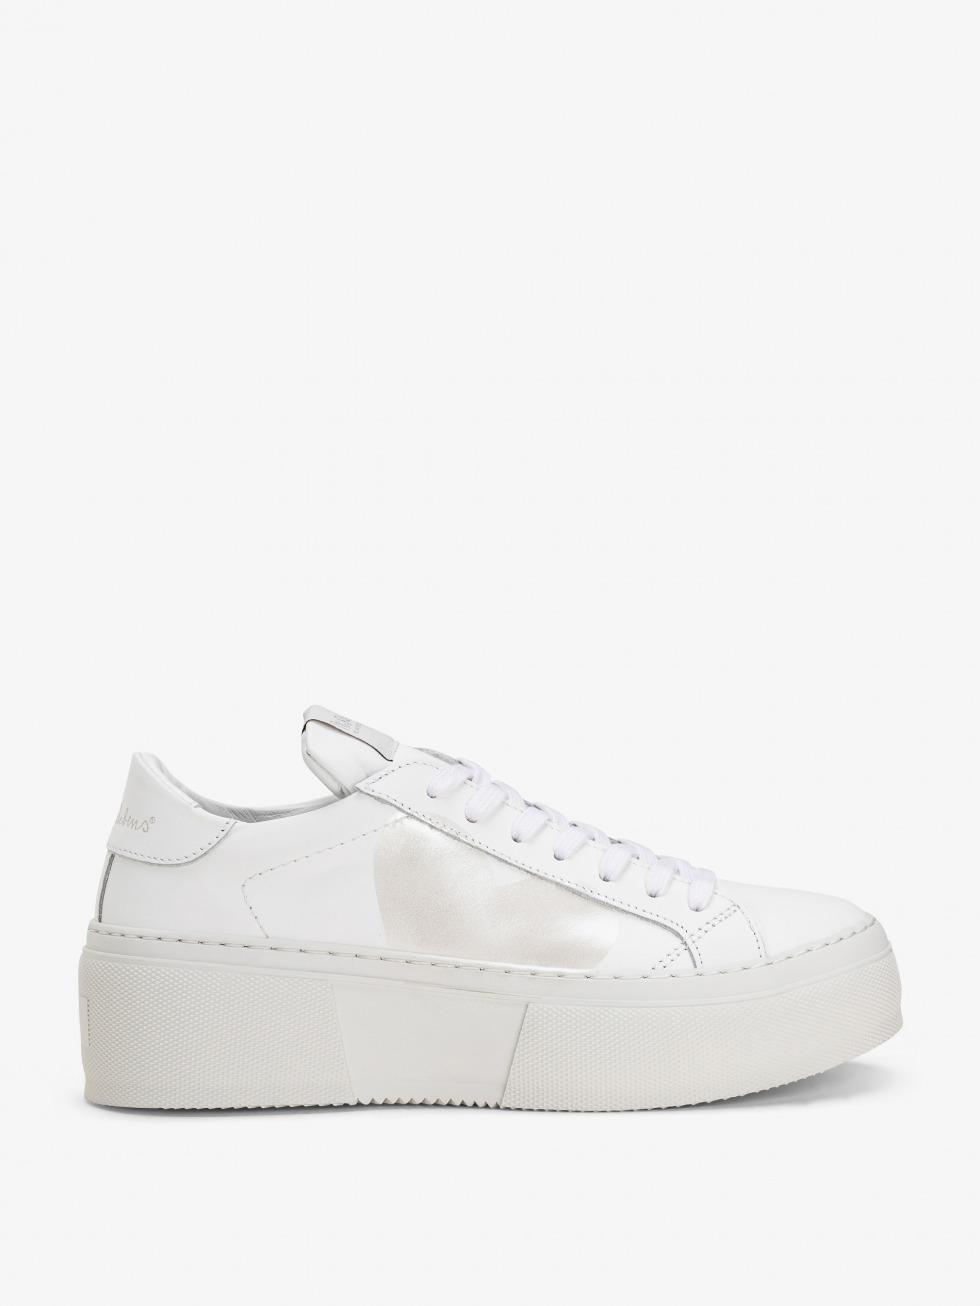 Platform Mimosa White Sneakers - Nacre Heart